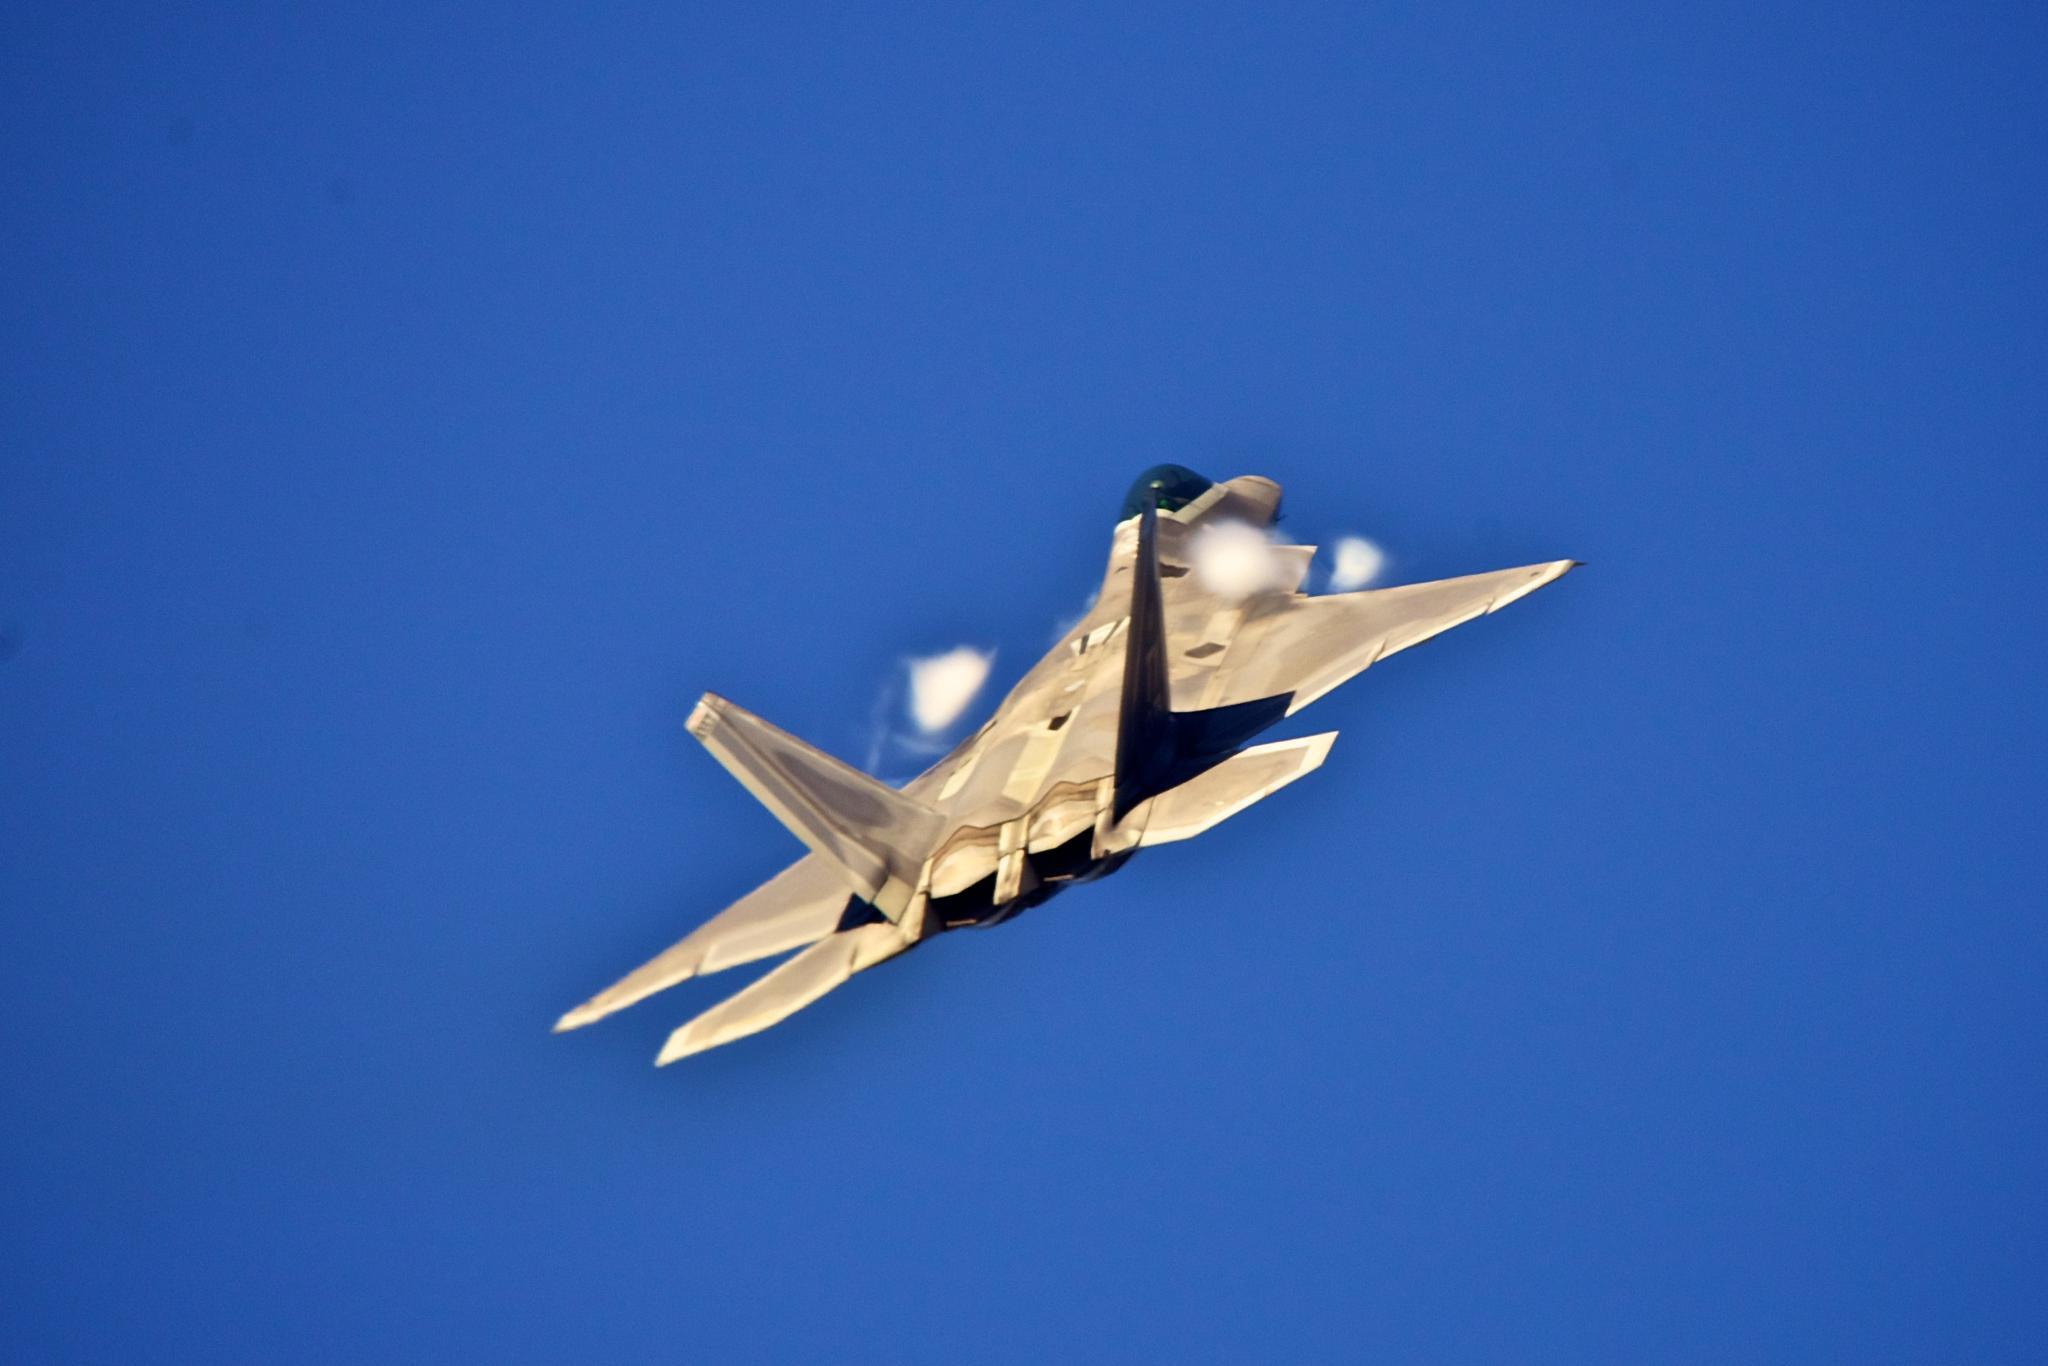 F-22 Raptor by Hugh Mitchell